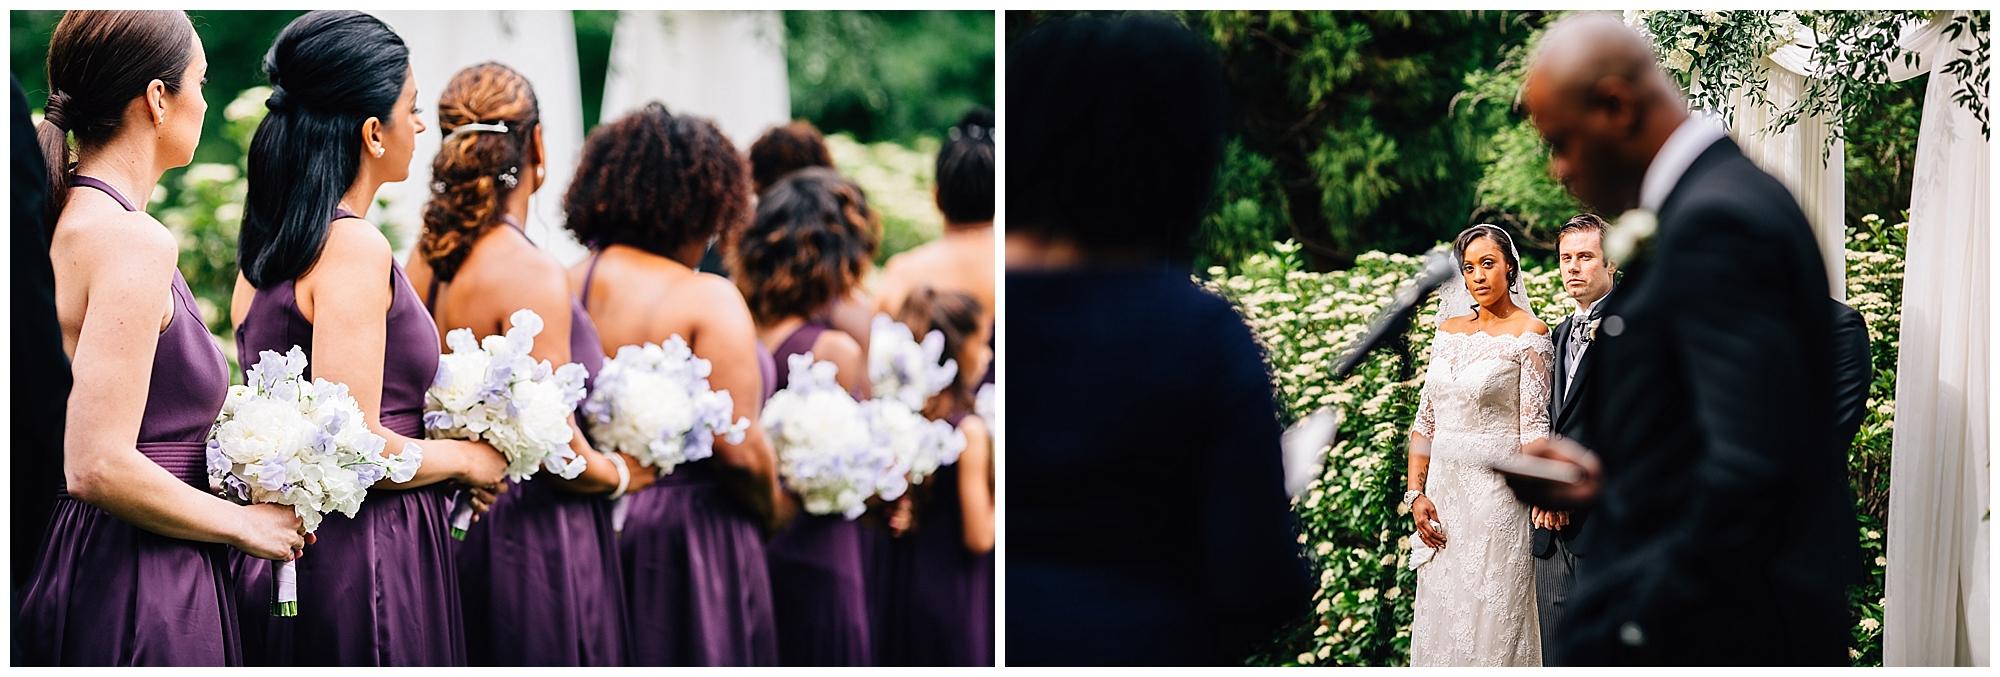 Umstead-wedding-photographer_0036.jpg